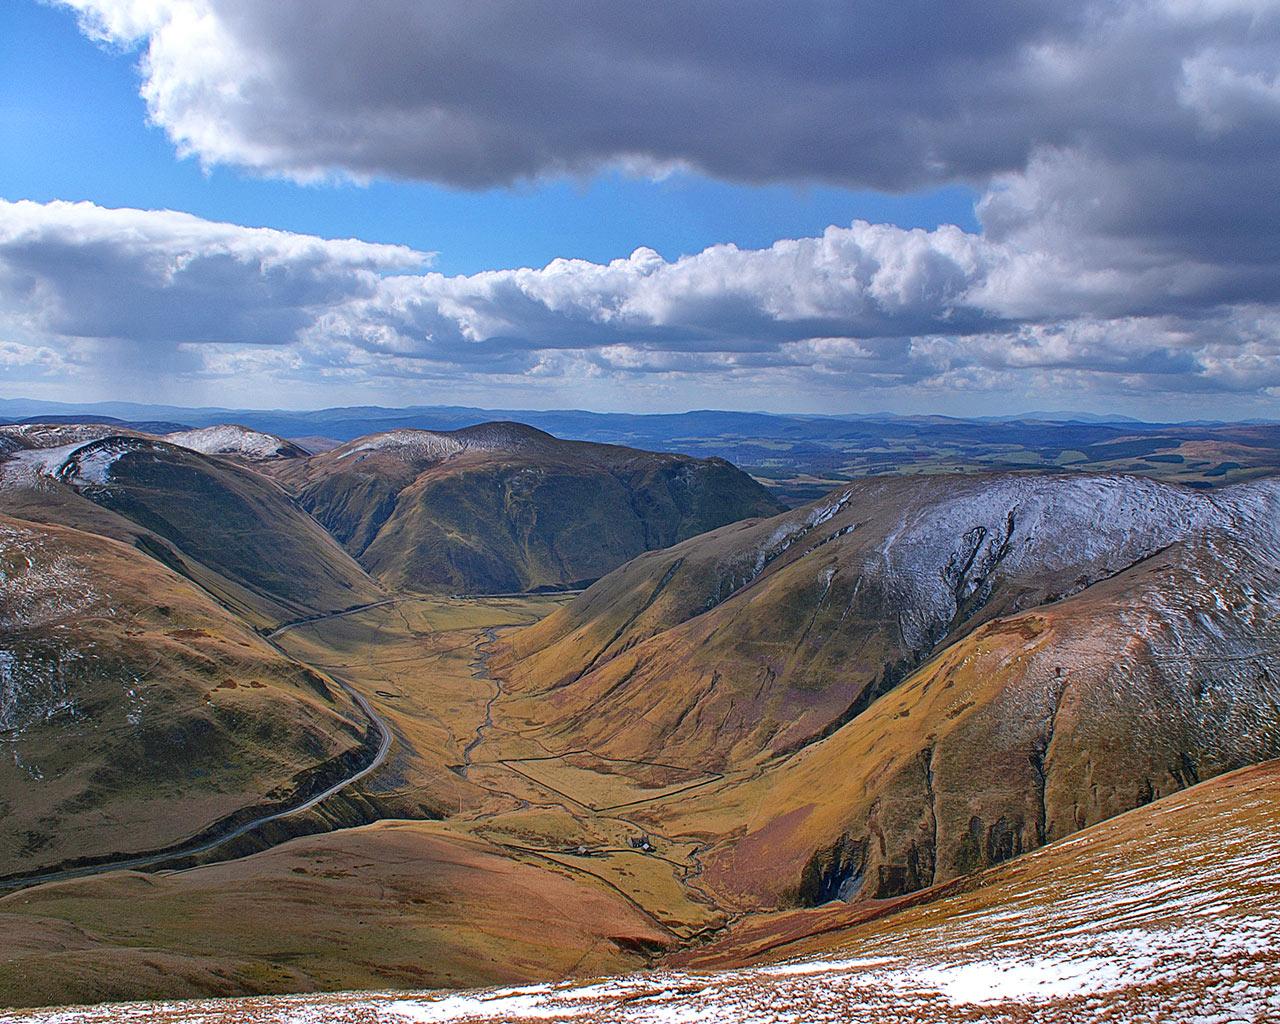 http://3.bp.blogspot.com/-4lcZl9853NM/TsTusko7jII/AAAAAAAABnA/Lrwpx9m3ORs/s1600/dalveenpass_winter_Scotland.jpg